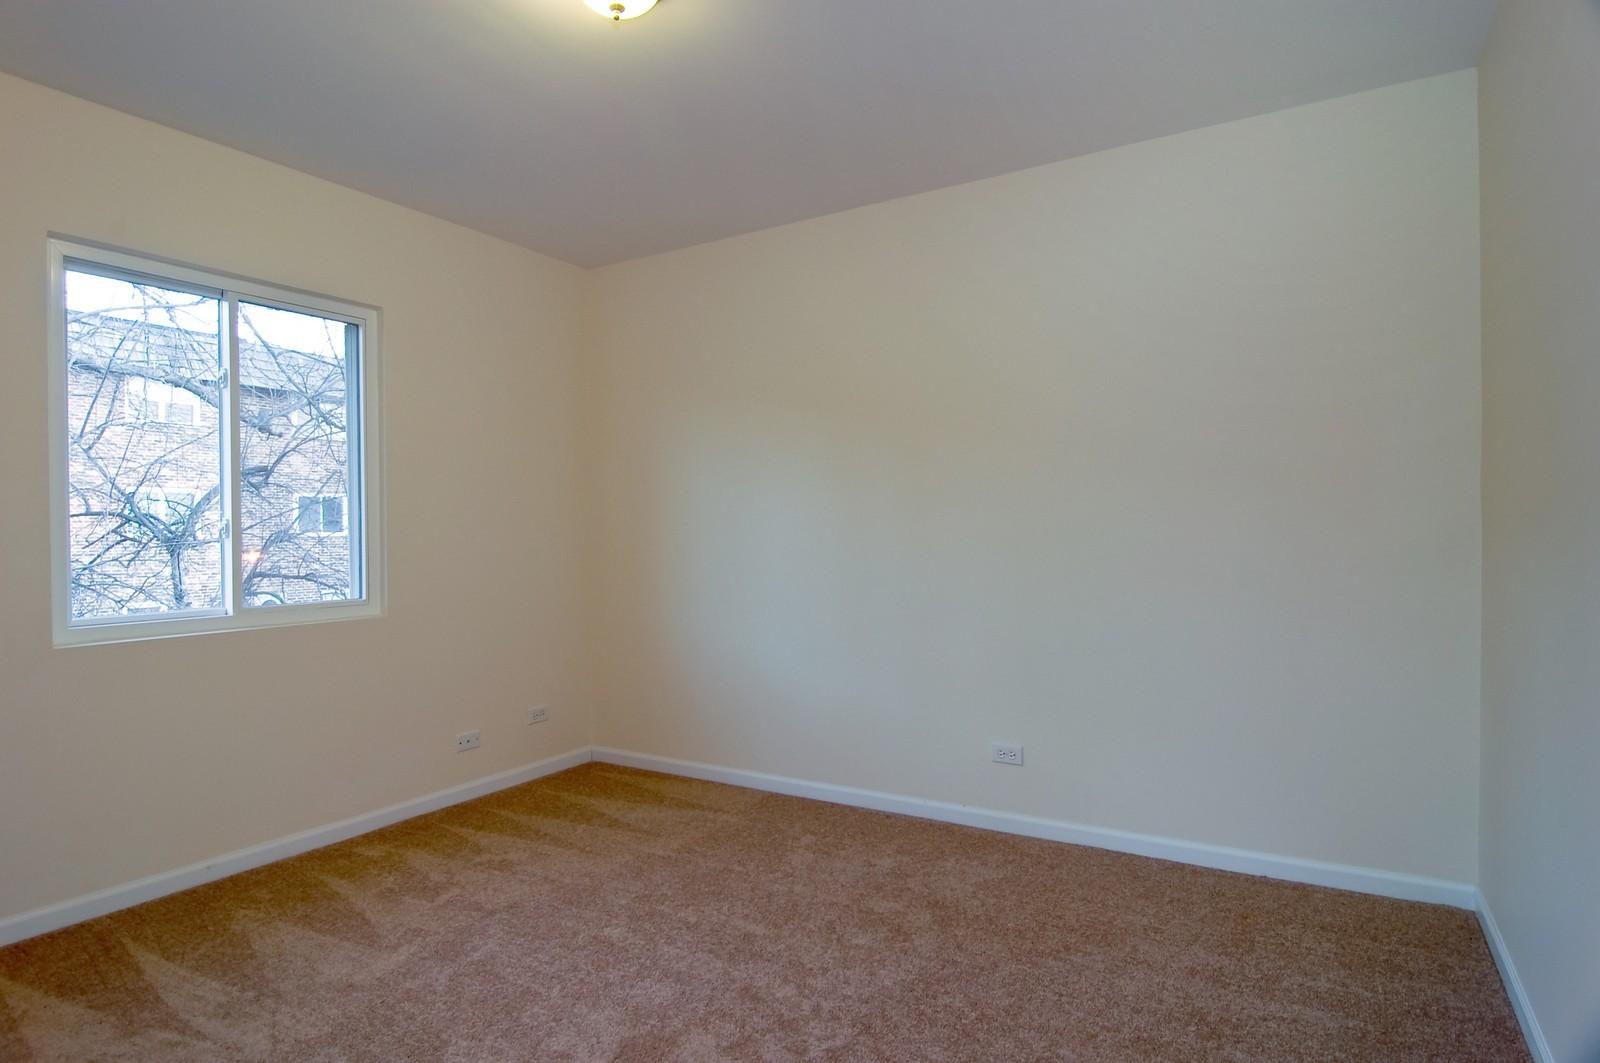 Real Estate Photography - 1623 McKool, Streamwood, IL, 60107 - Bedroom